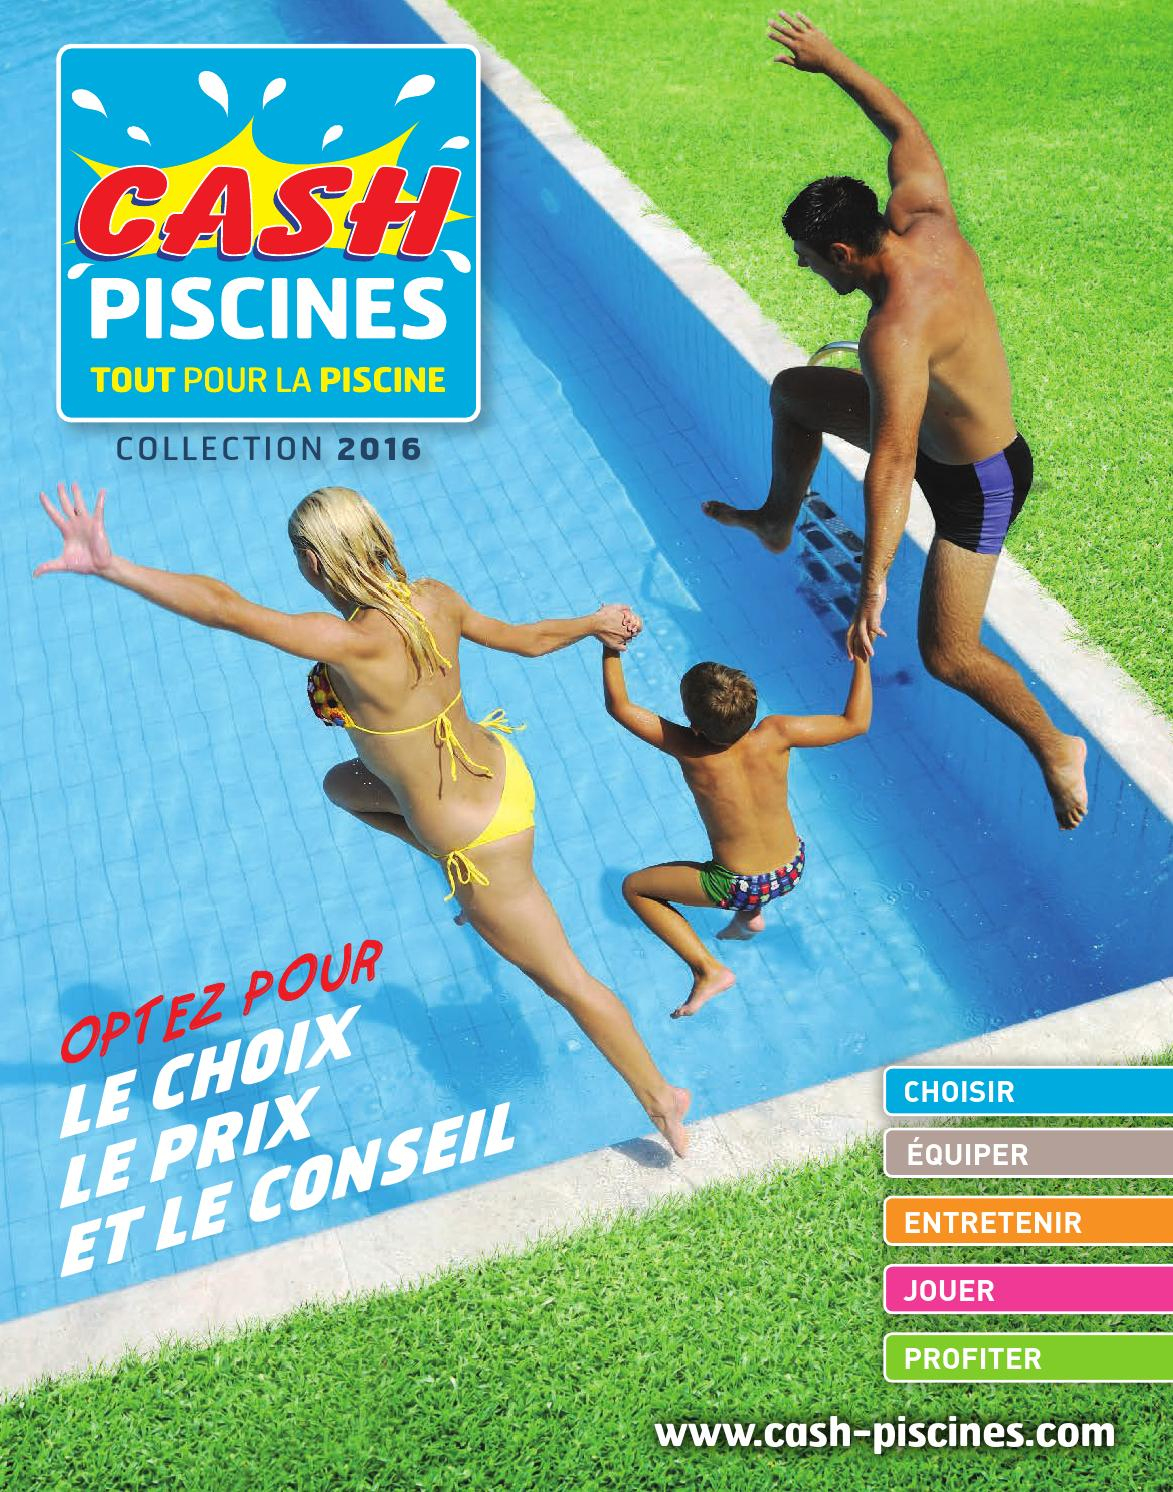 Cash Piscines 2016 By Octave Octave - Issuu avec Cash Piscine Narbonne